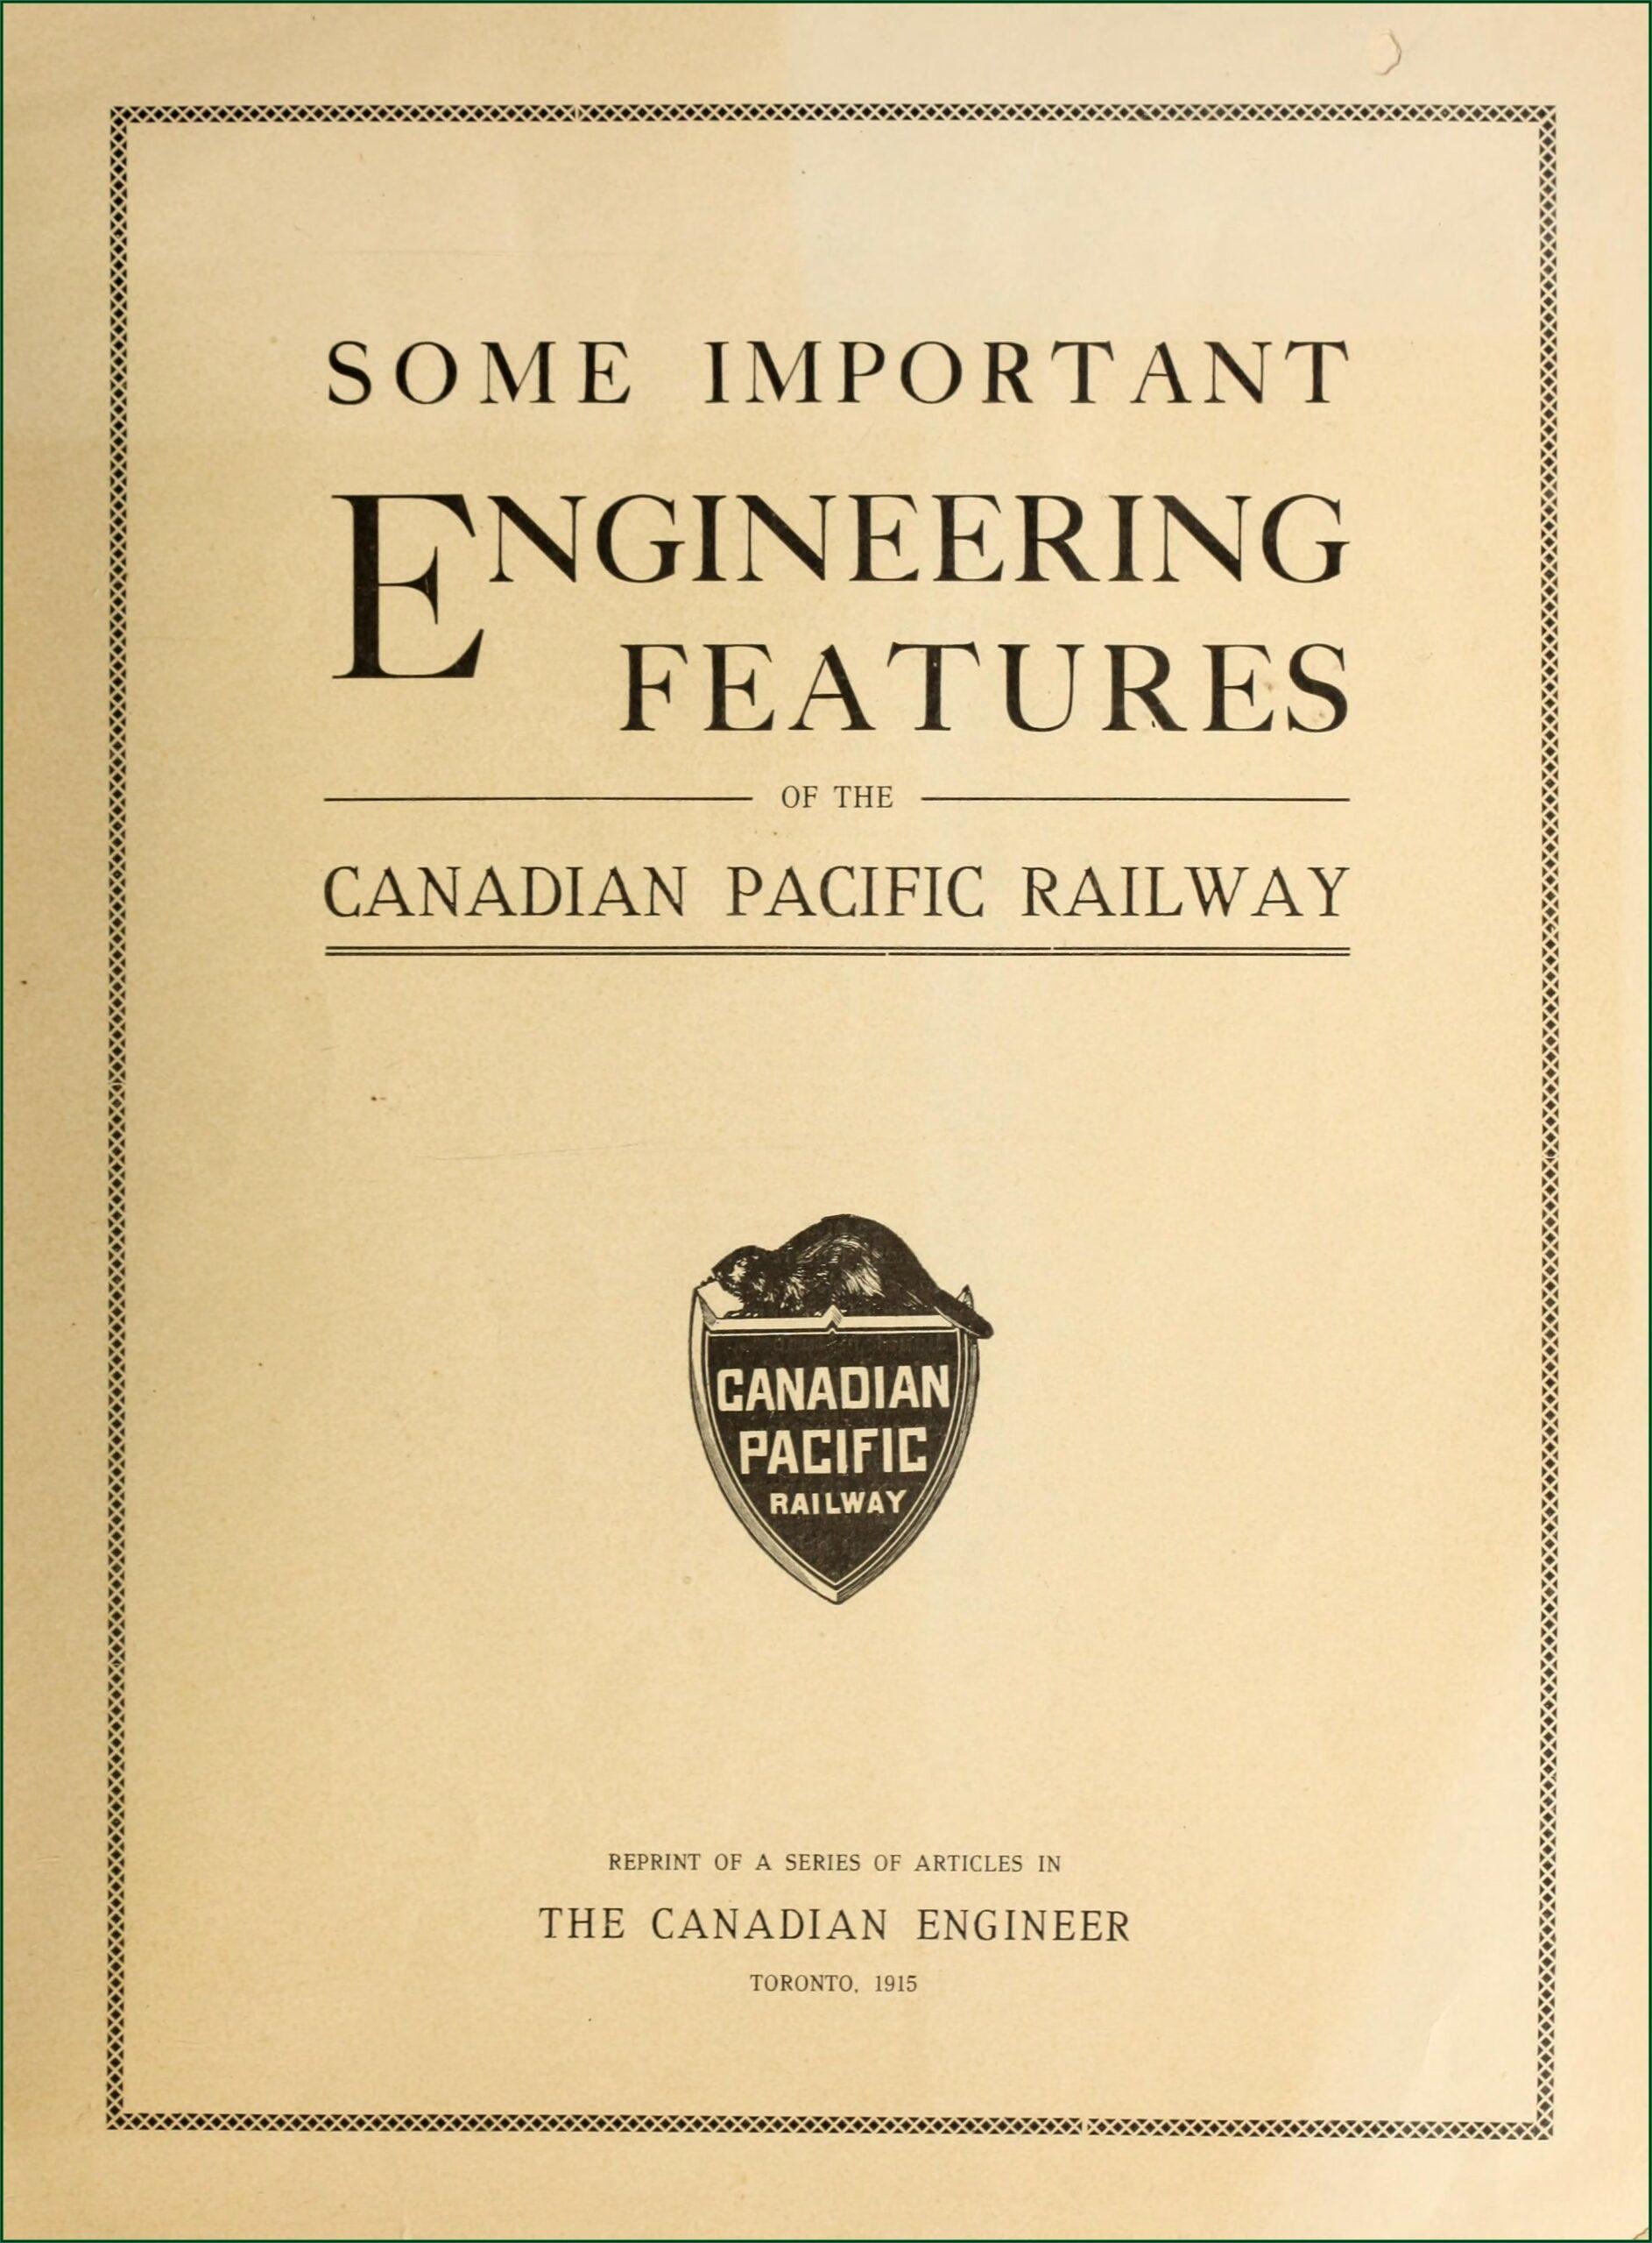 Canadian Pacific Railway Timeline Prezi